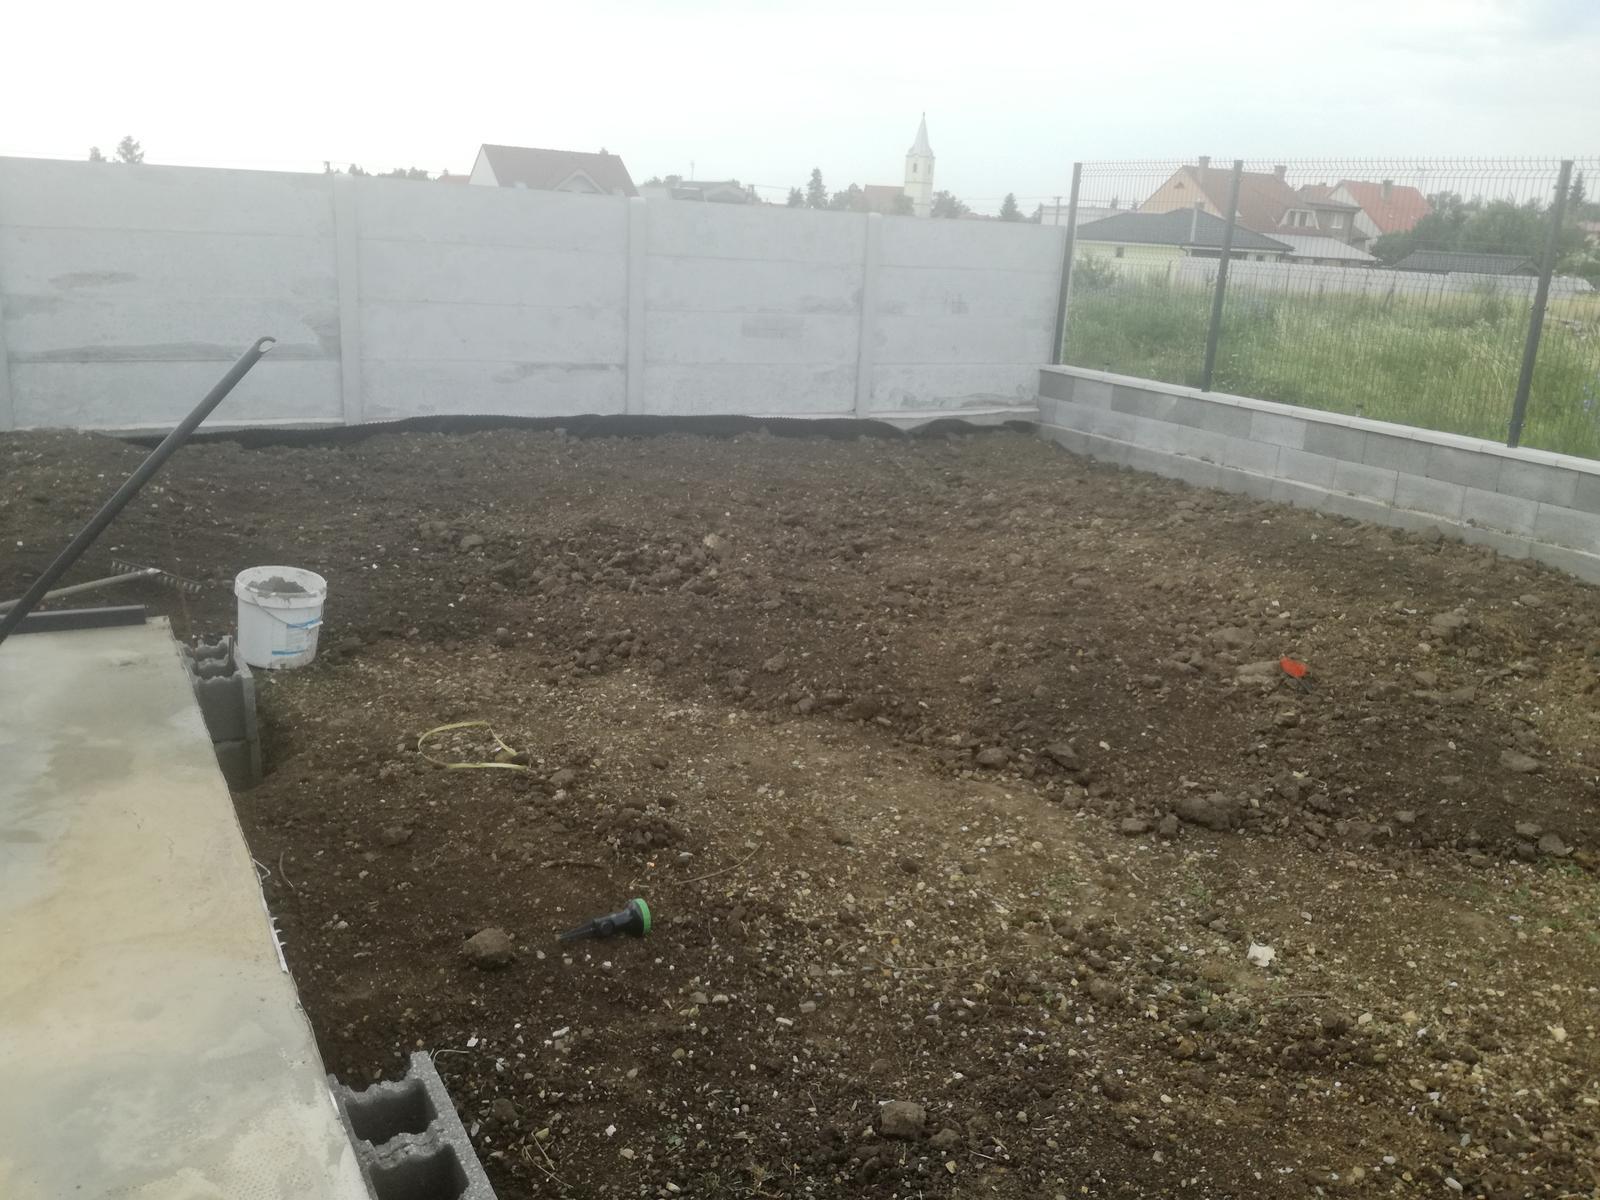 Minidomček pod Karpatmi - rozhadzujeme kopy zeminy z vykopu plota, zrovnavame, trhame burinu ...